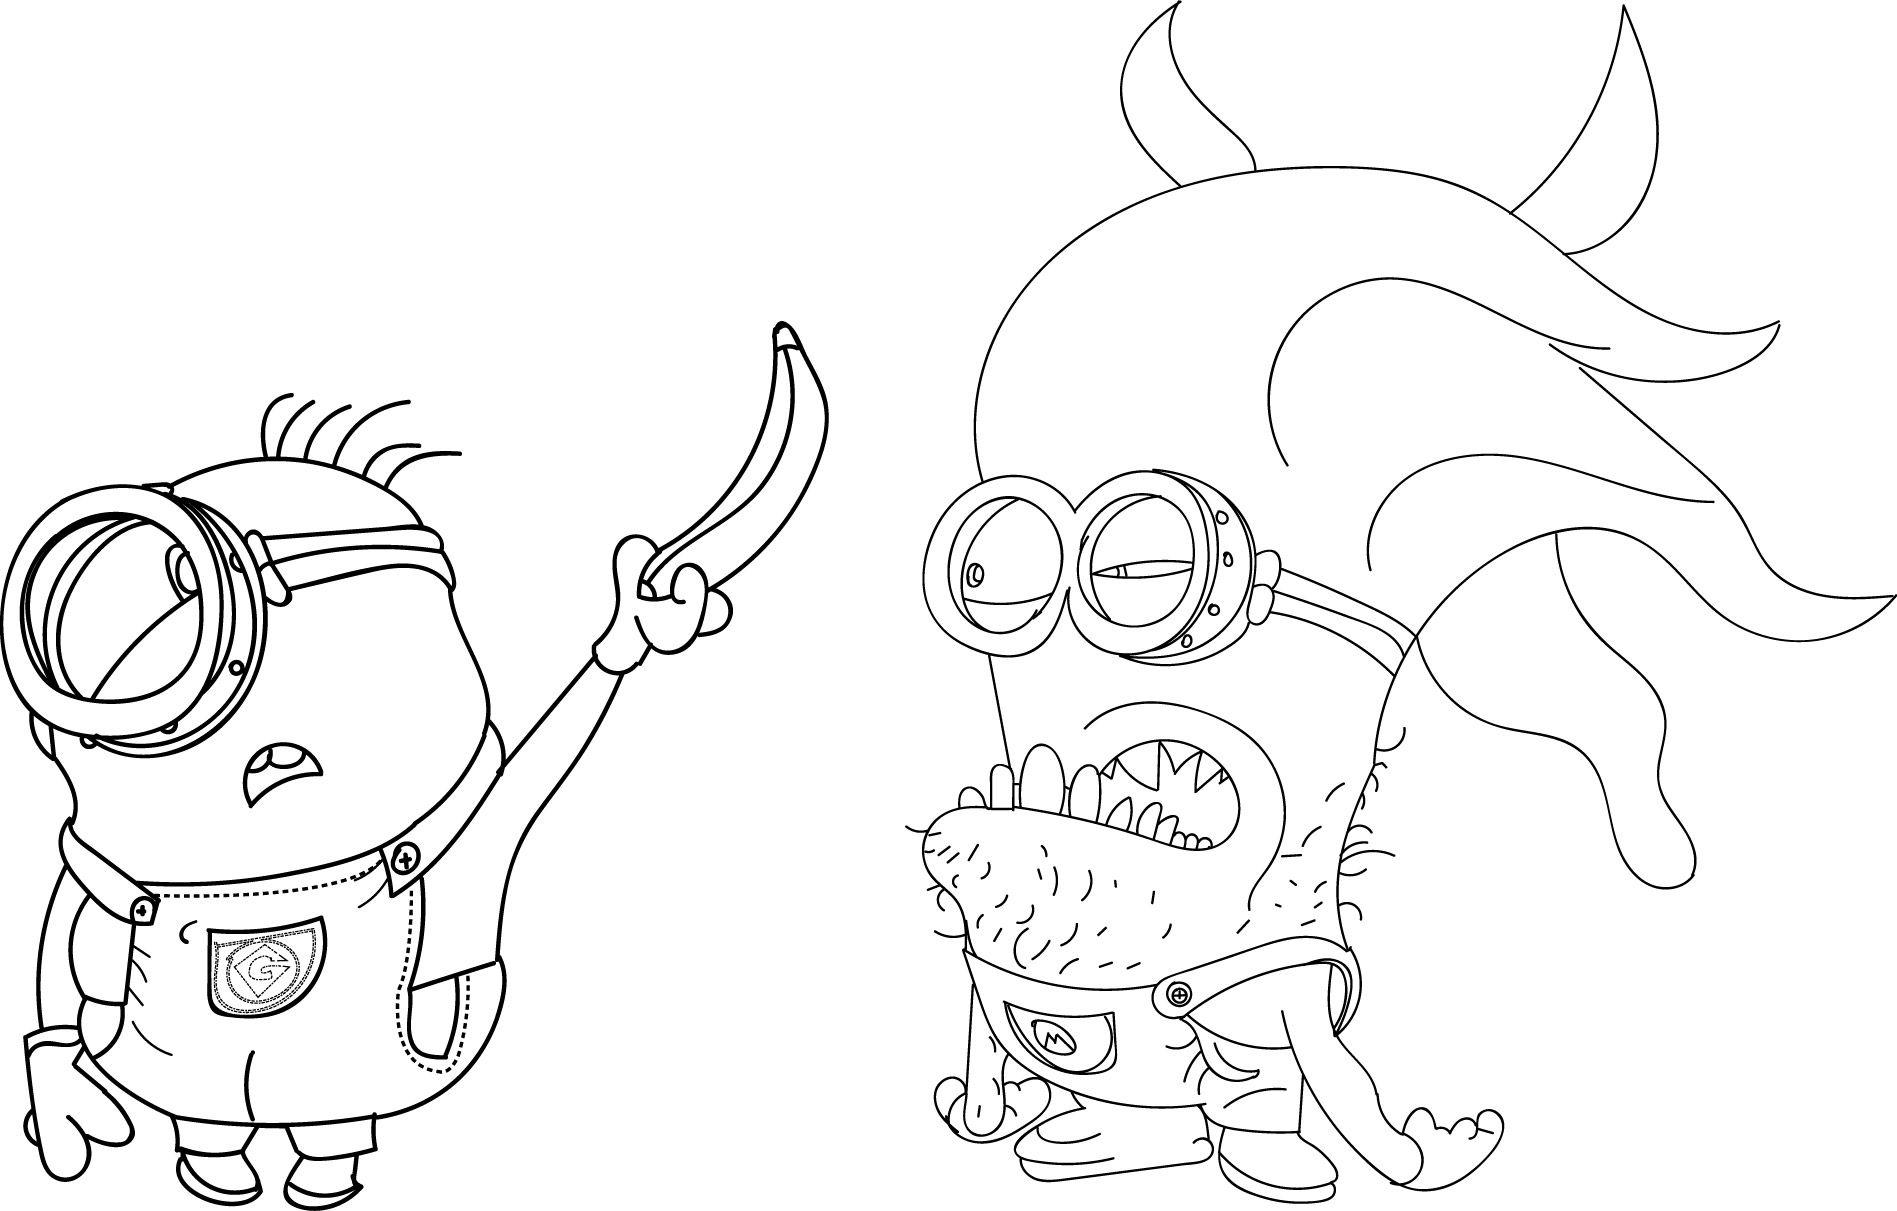 Minion-Creature-Banana-Catch-Coloring-Page - Wecoloringpage